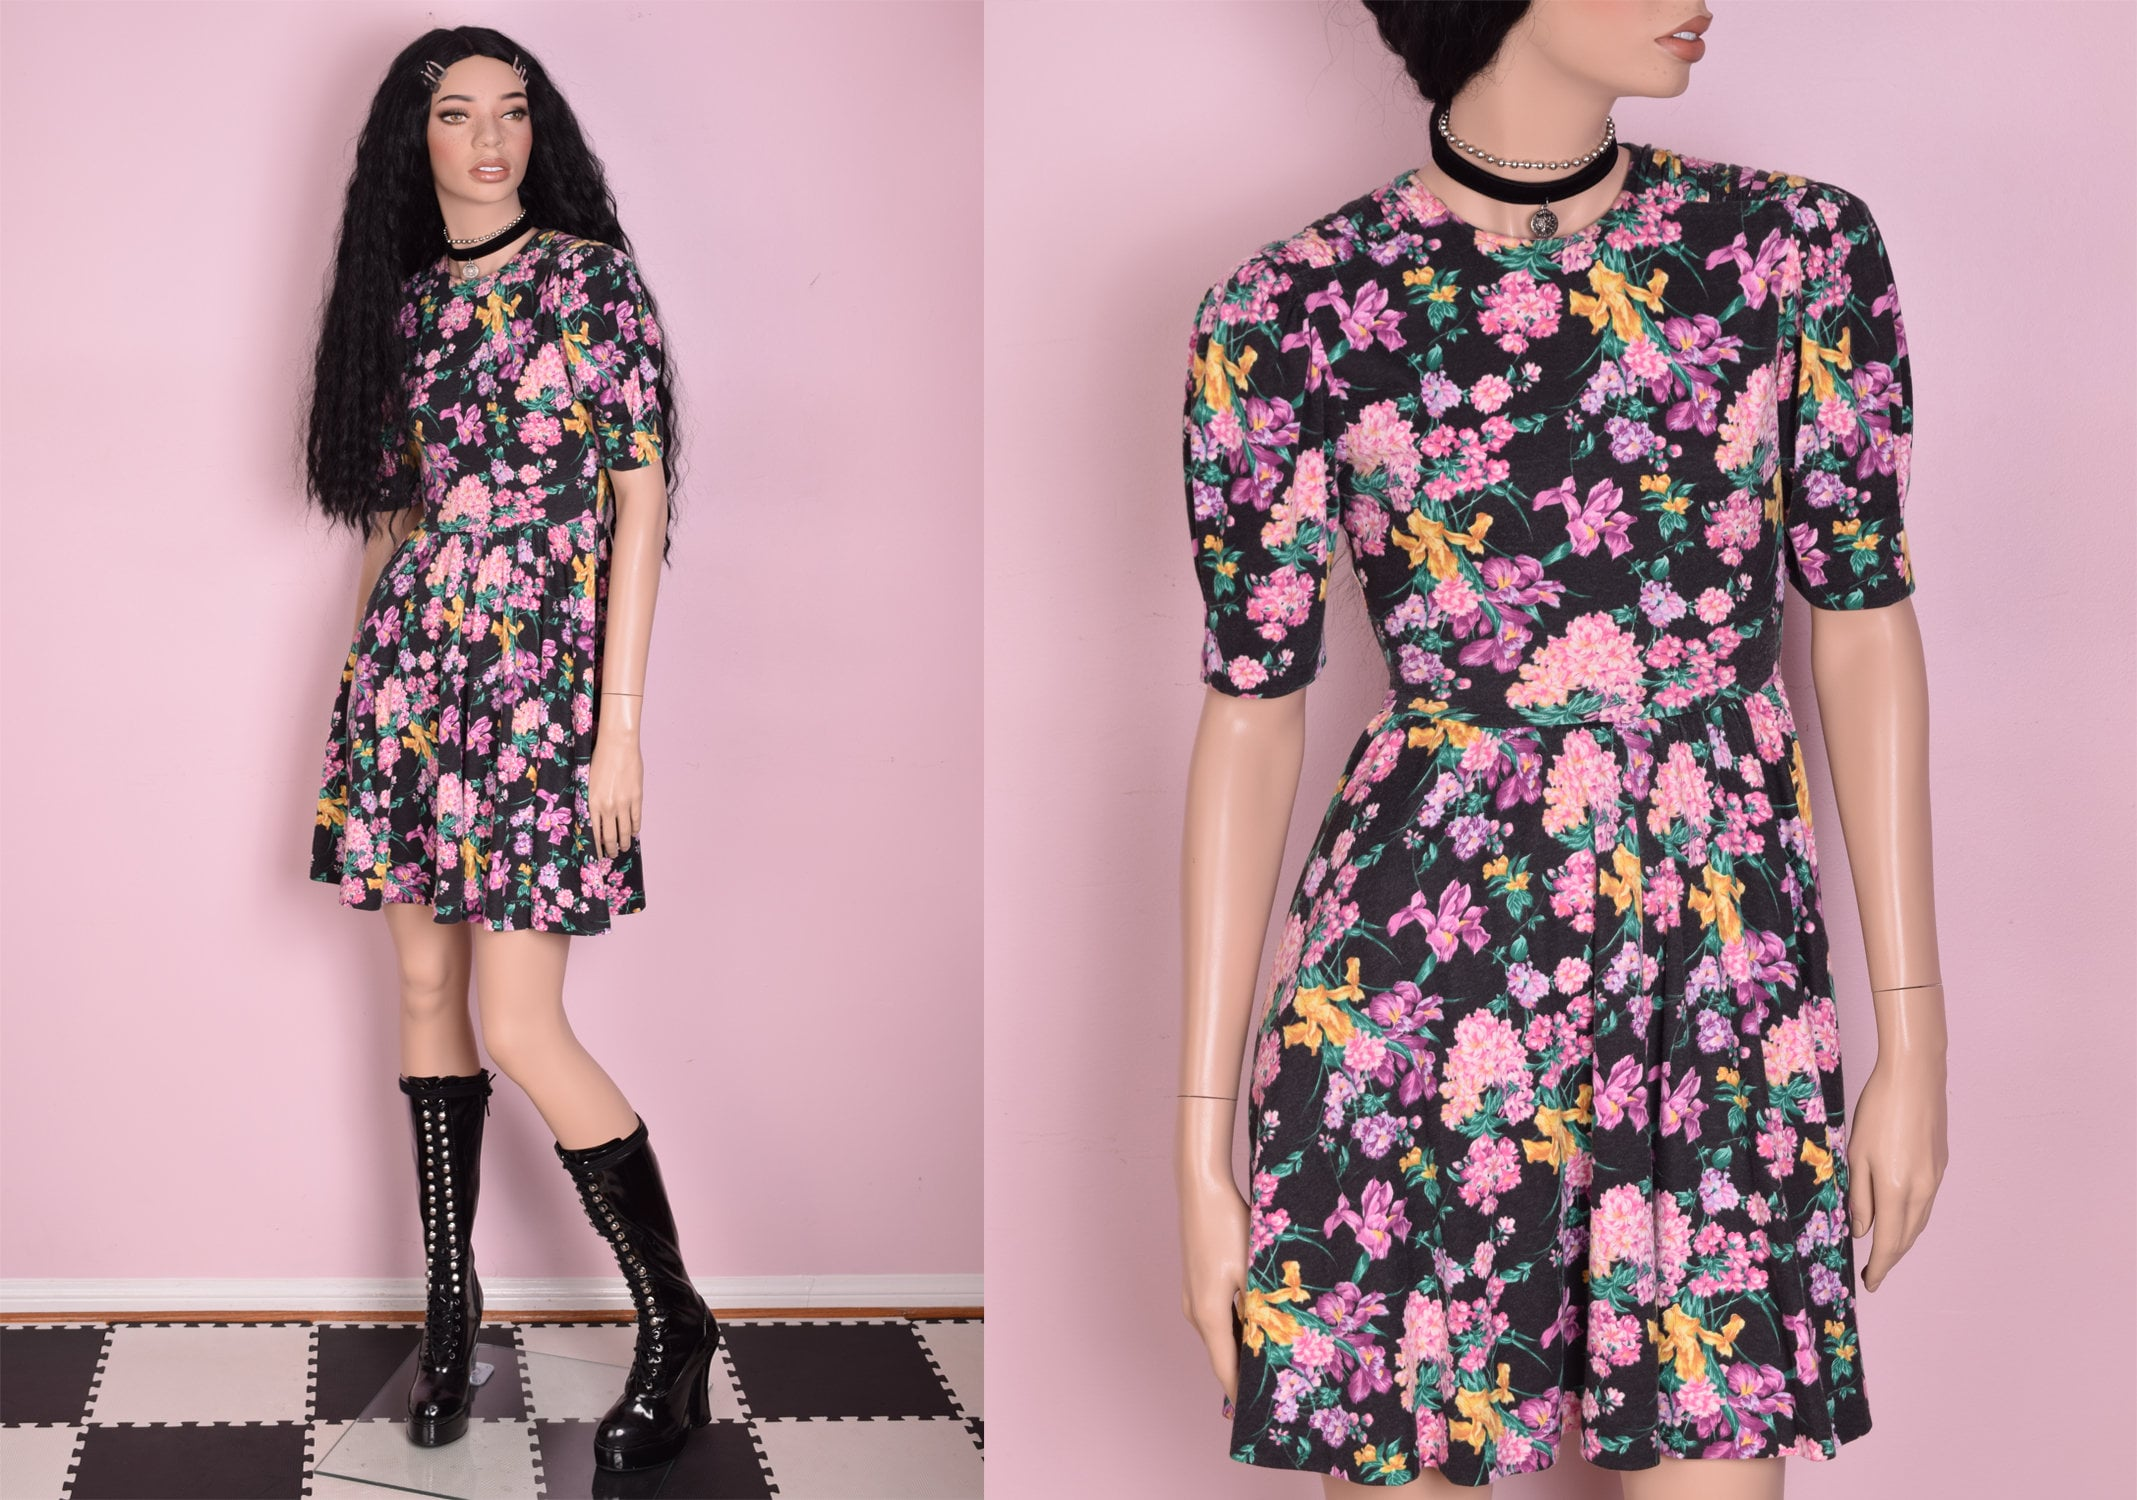 80s Dresses | Casual to Party Dresses 80S Floral Print Knit Dress Us 2 1980S $27.62 AT vintagedancer.com